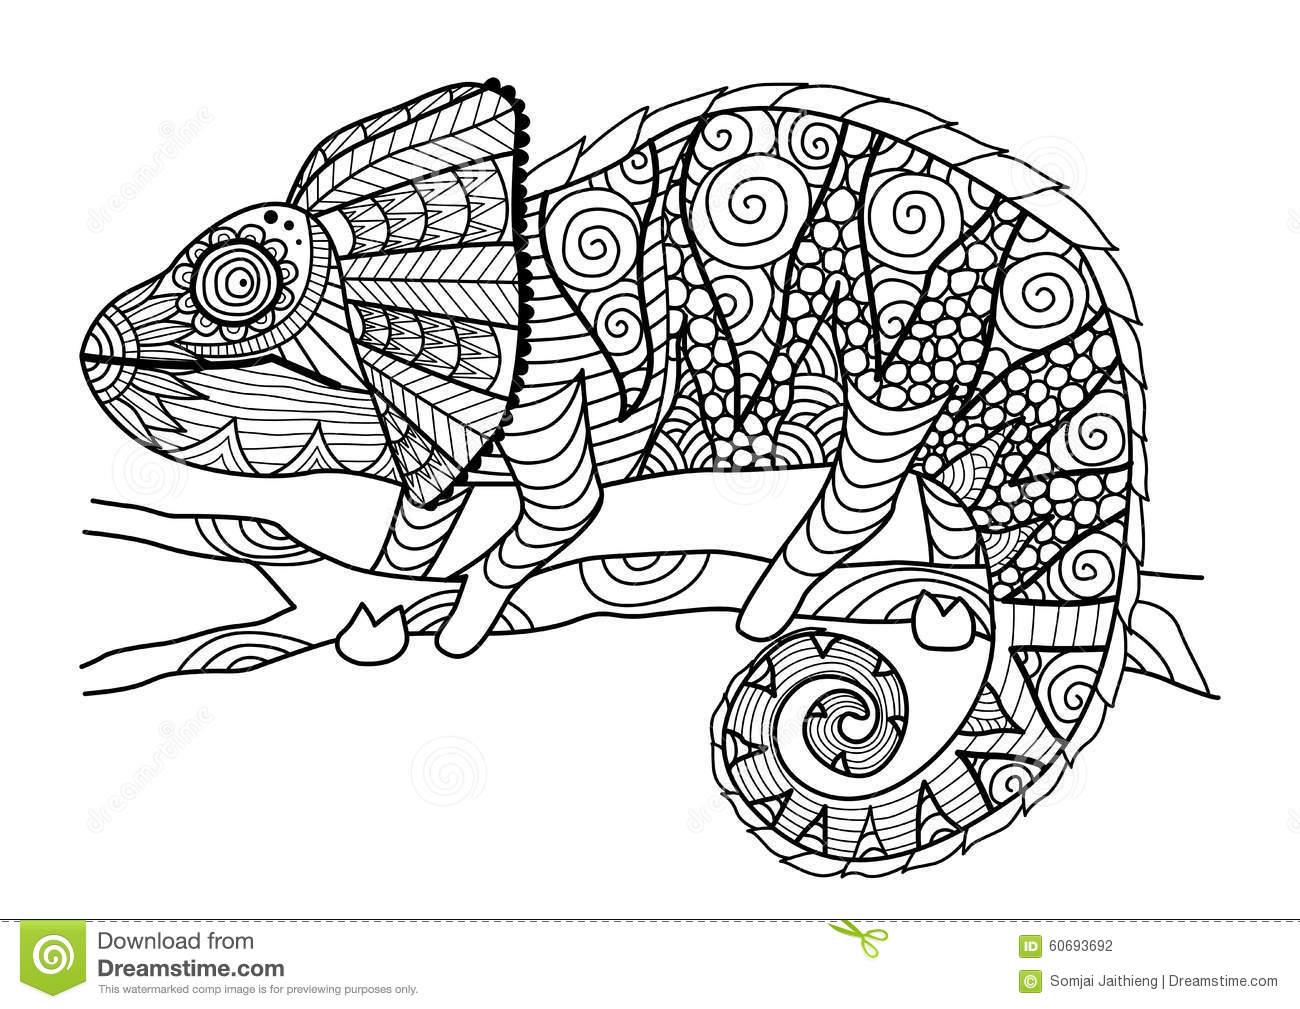 Mandalas De Animales Para Pintar Abstracto Pintar Tattoo: Creandi: Mandalas Para Imprimir Y Pintar